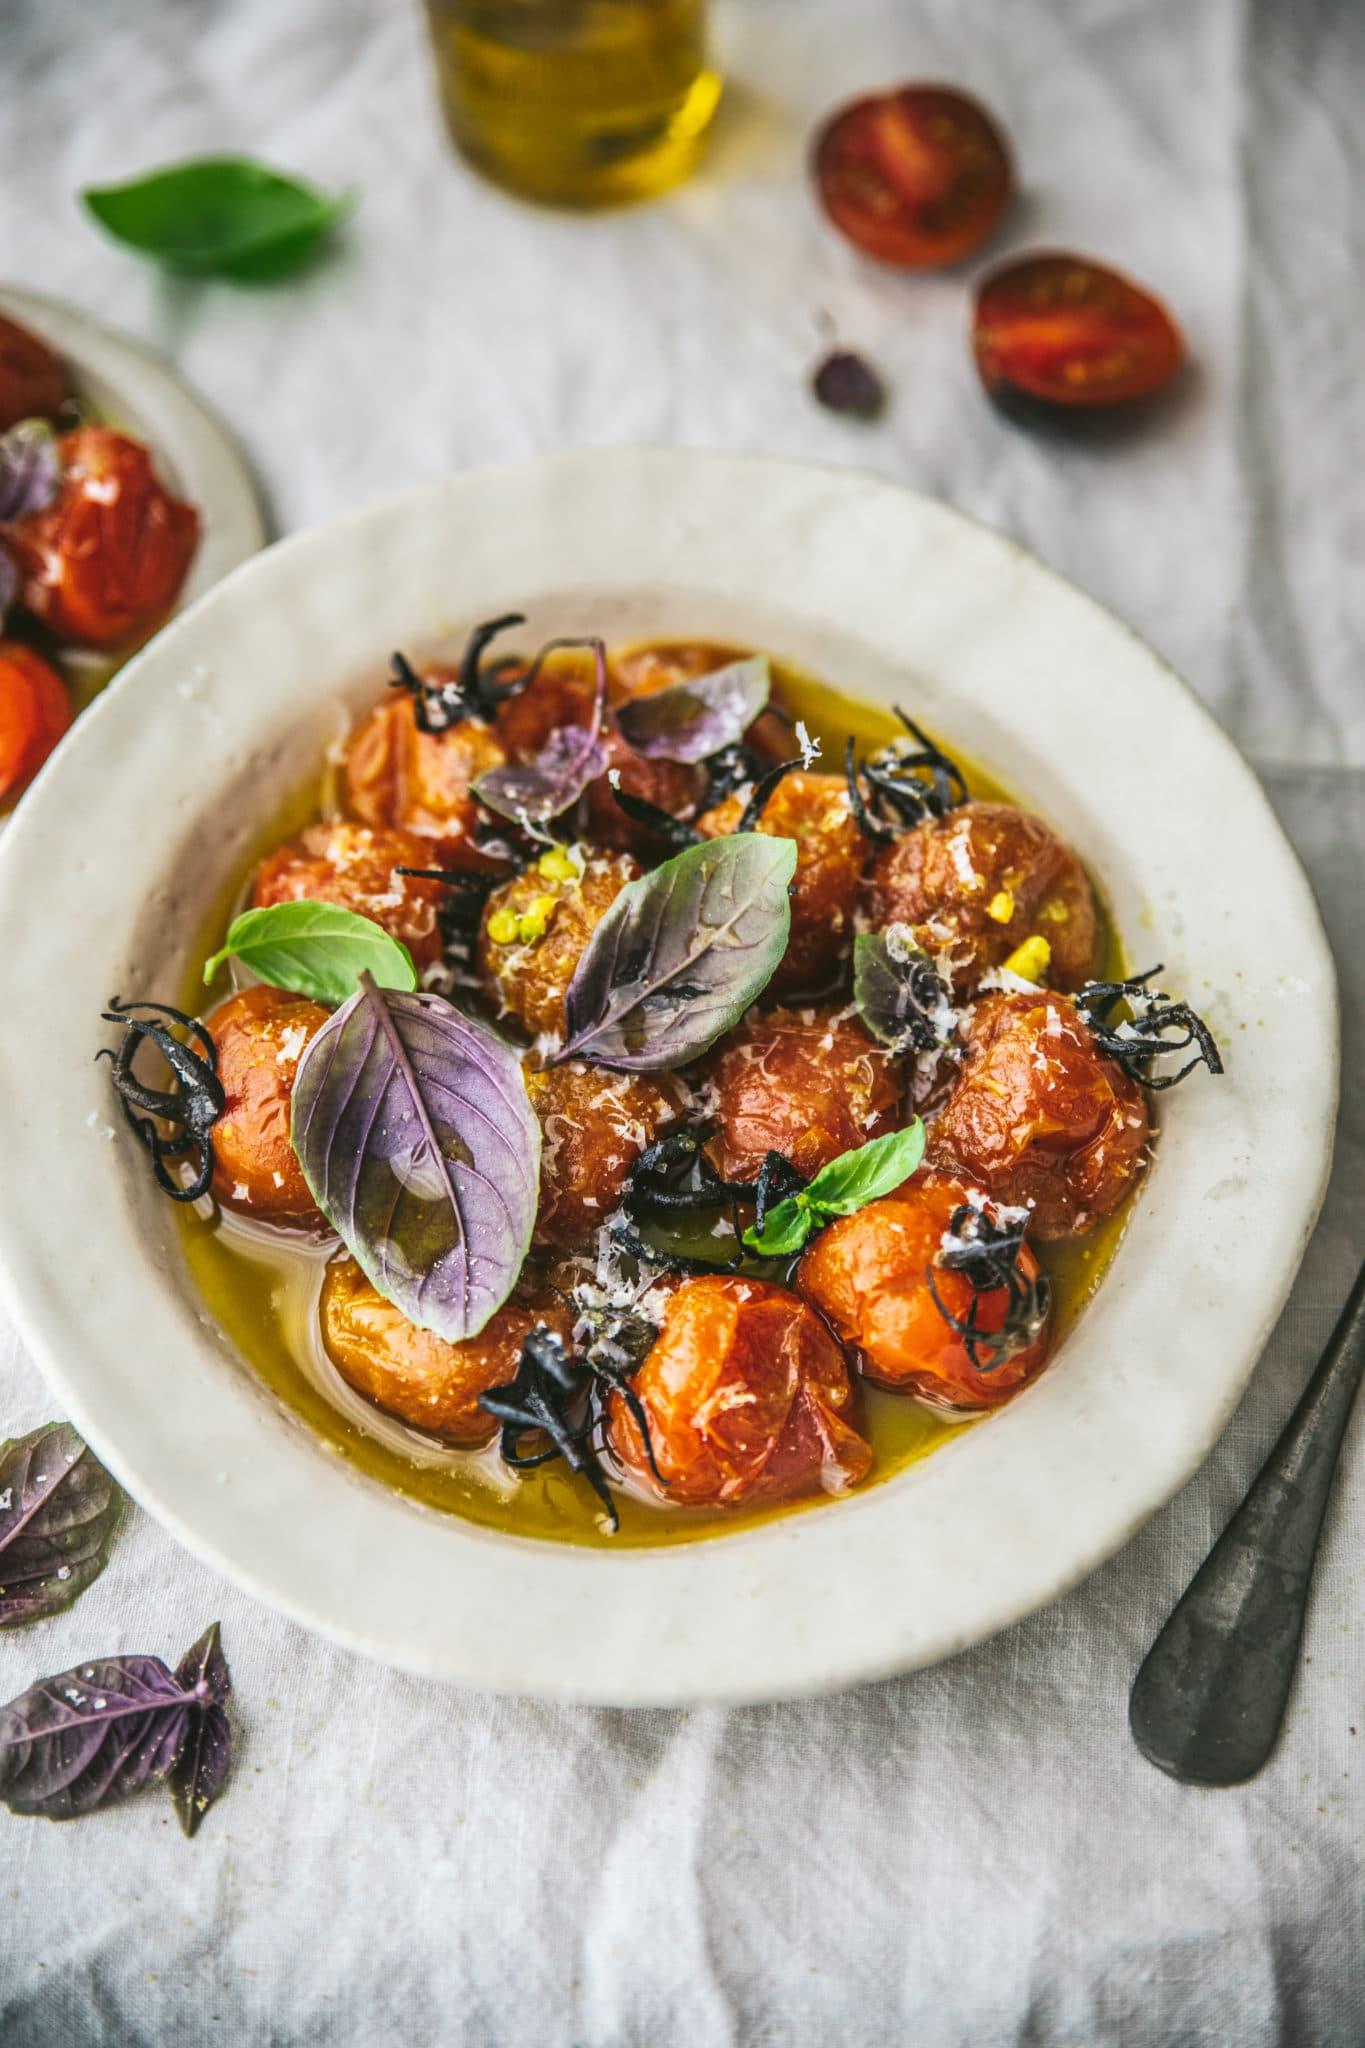 Tomates confites Mégane Ardérighi - megandcook styliste culinaire lyon